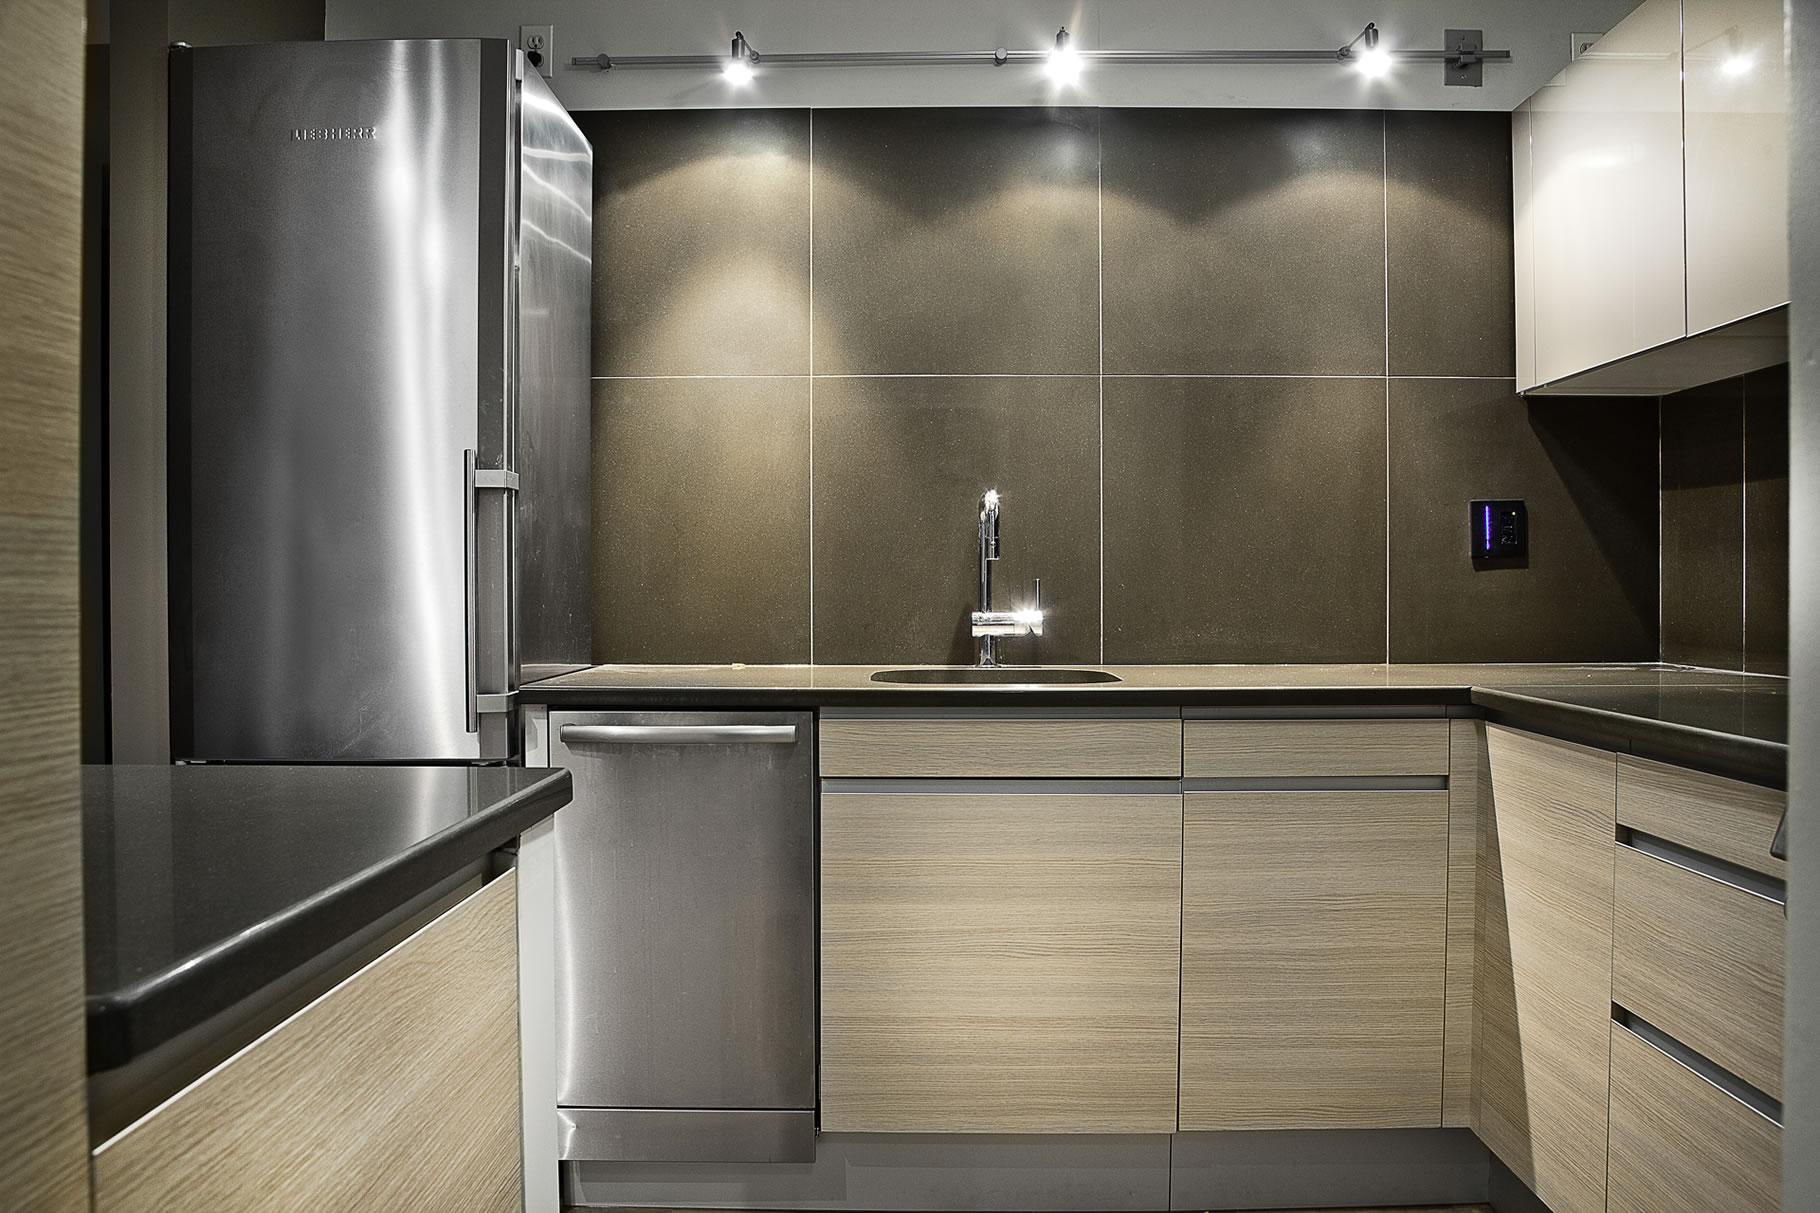 condominiums kitchen remodeling chicago Chicago Kitchen Remodel